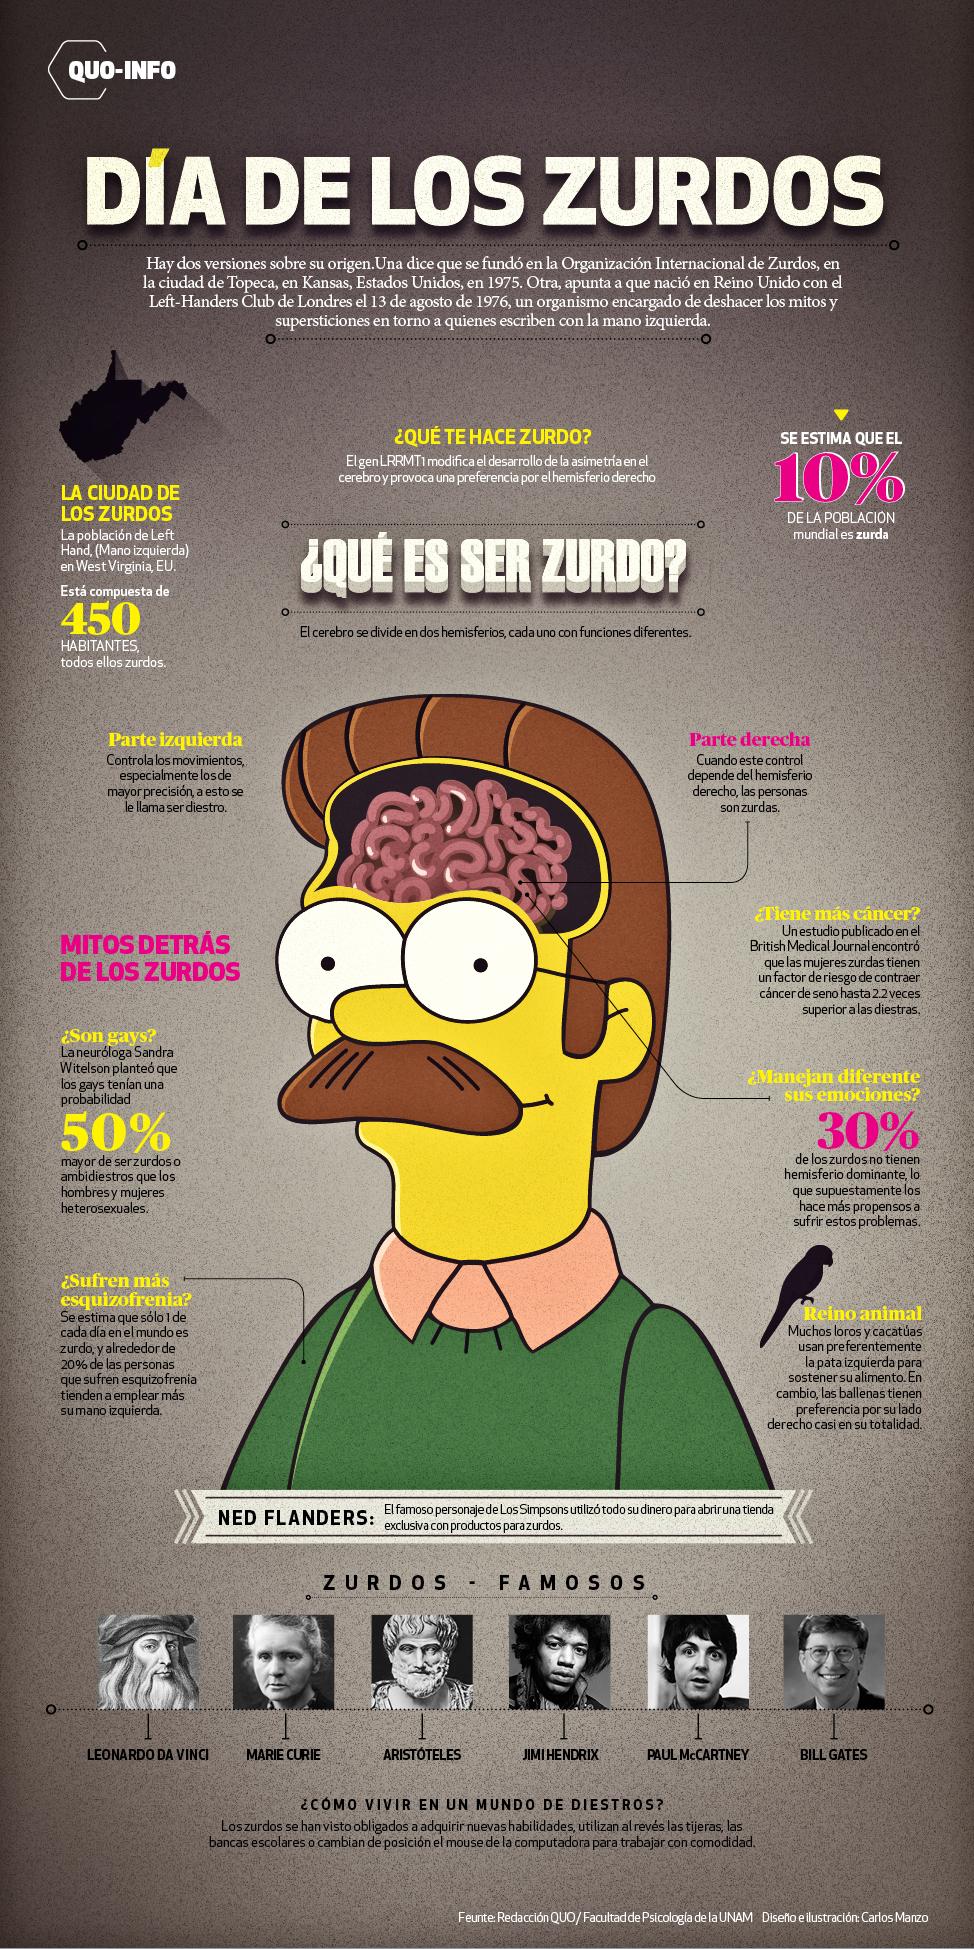 Qué es ser zurdo #infografia #infographic